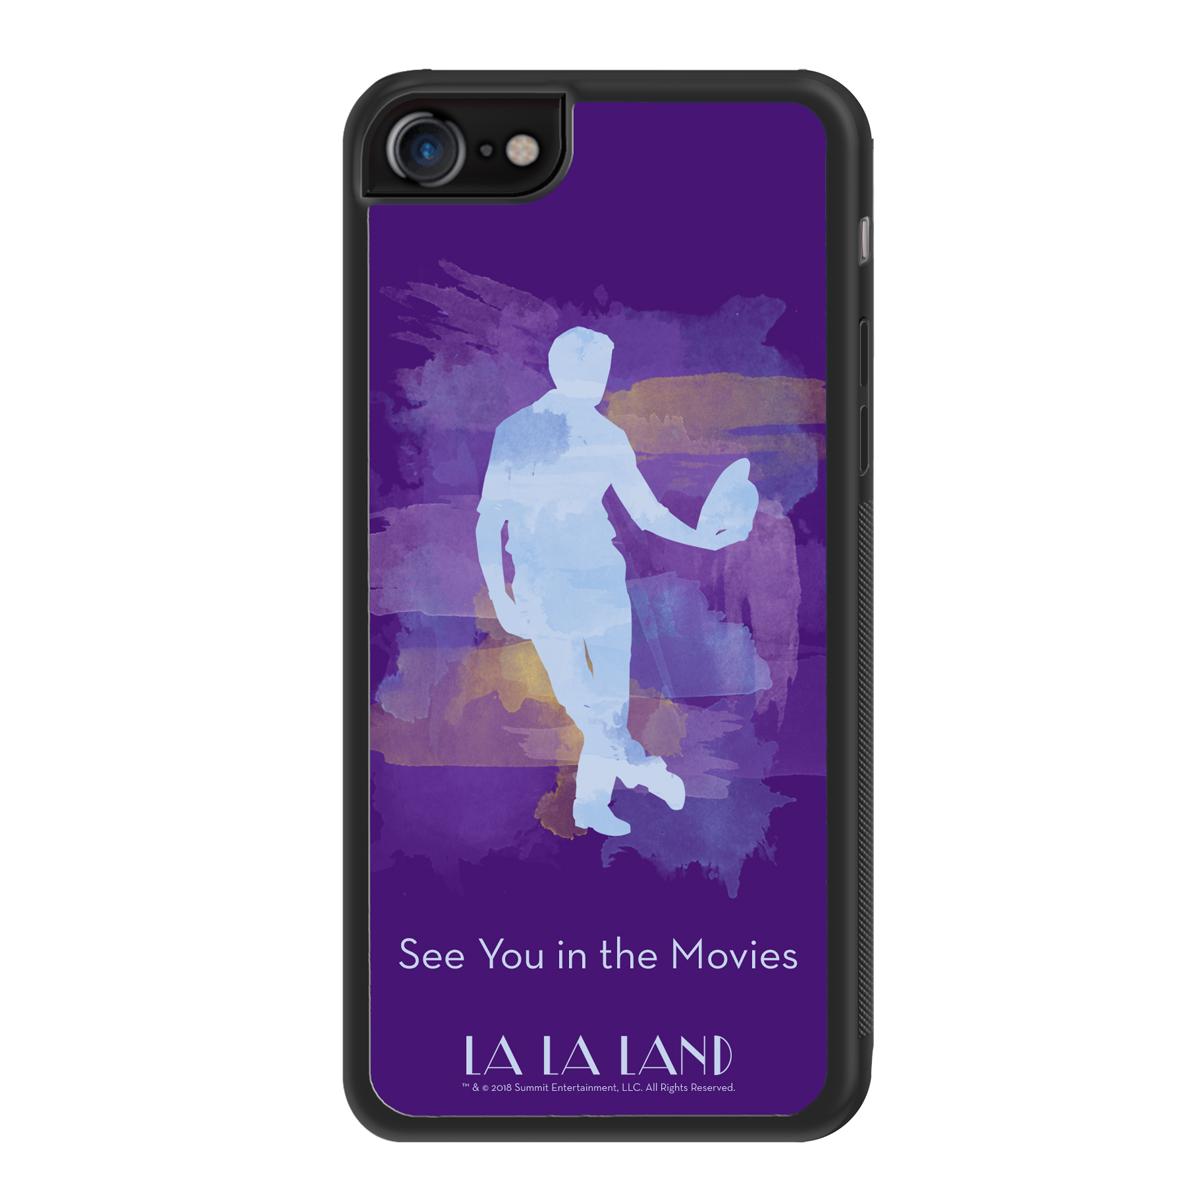 La La Land Movies iPhone 7 Case